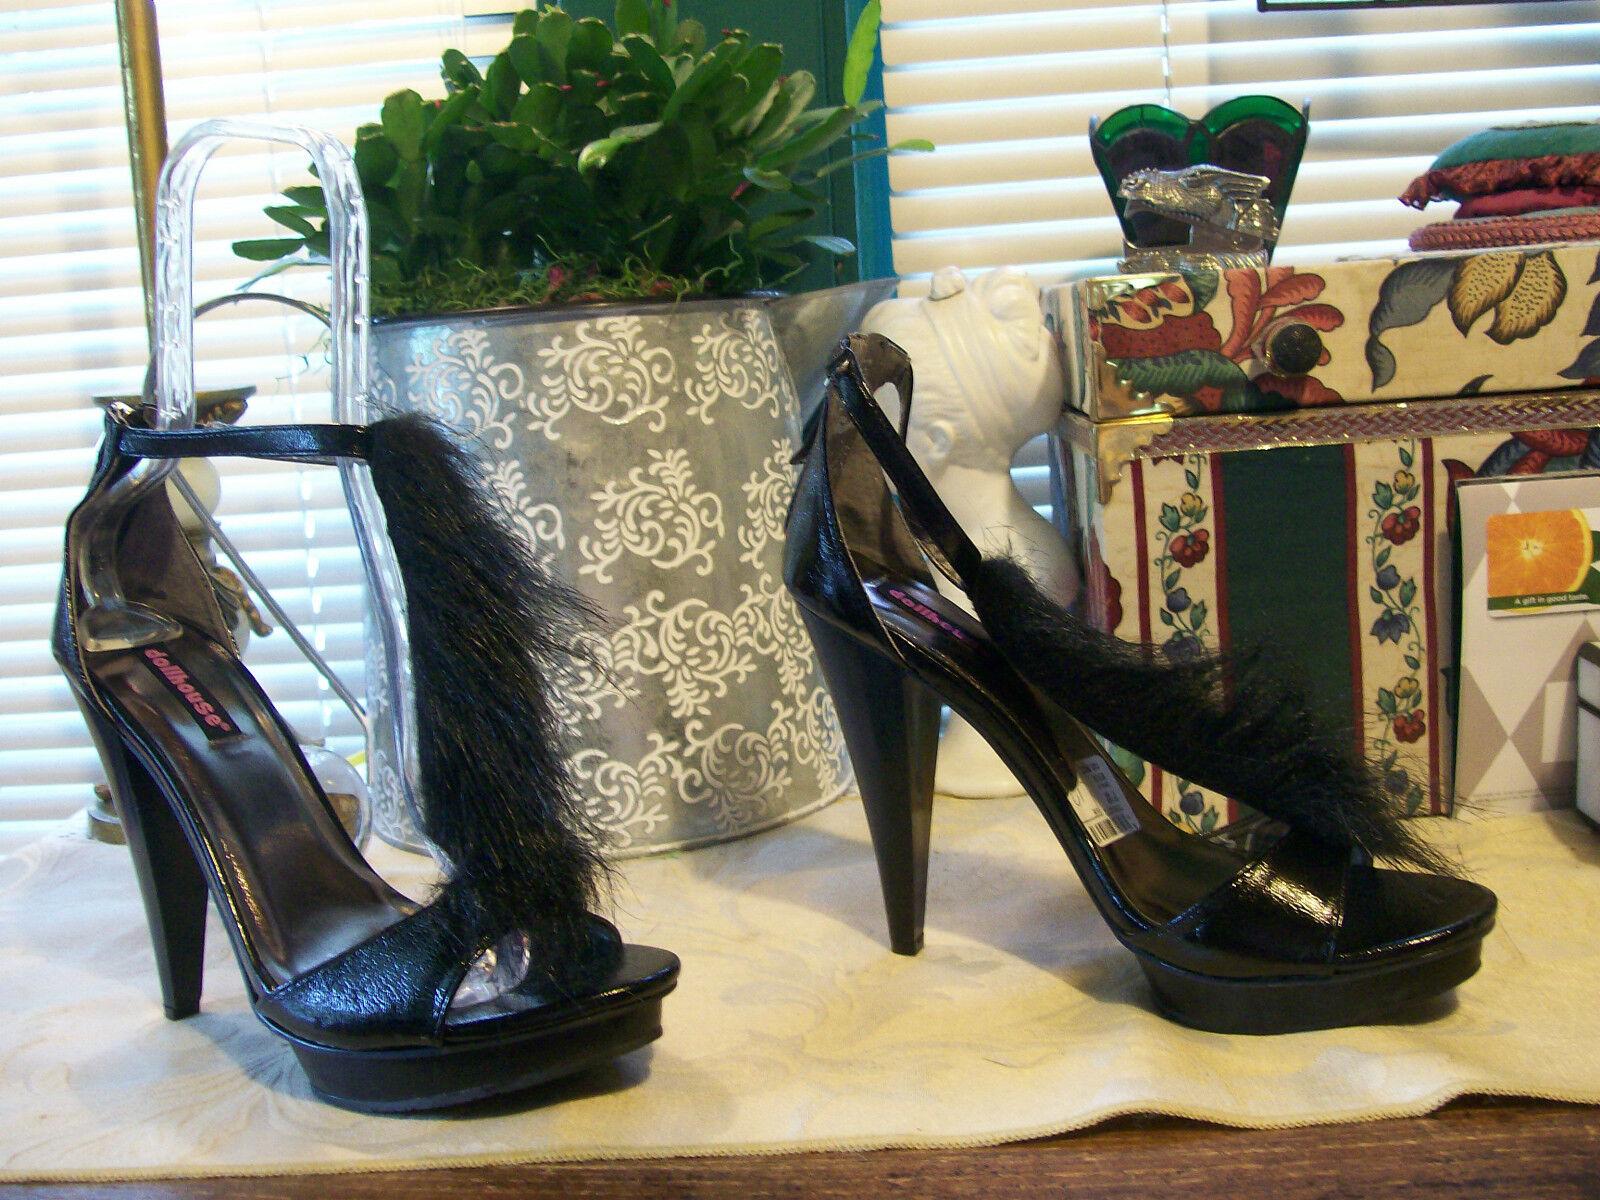 Dollhouse Crinkled Paent Peep Toe/T-Ankle Strap/Heel Zipper StilettosSZ 10 Black